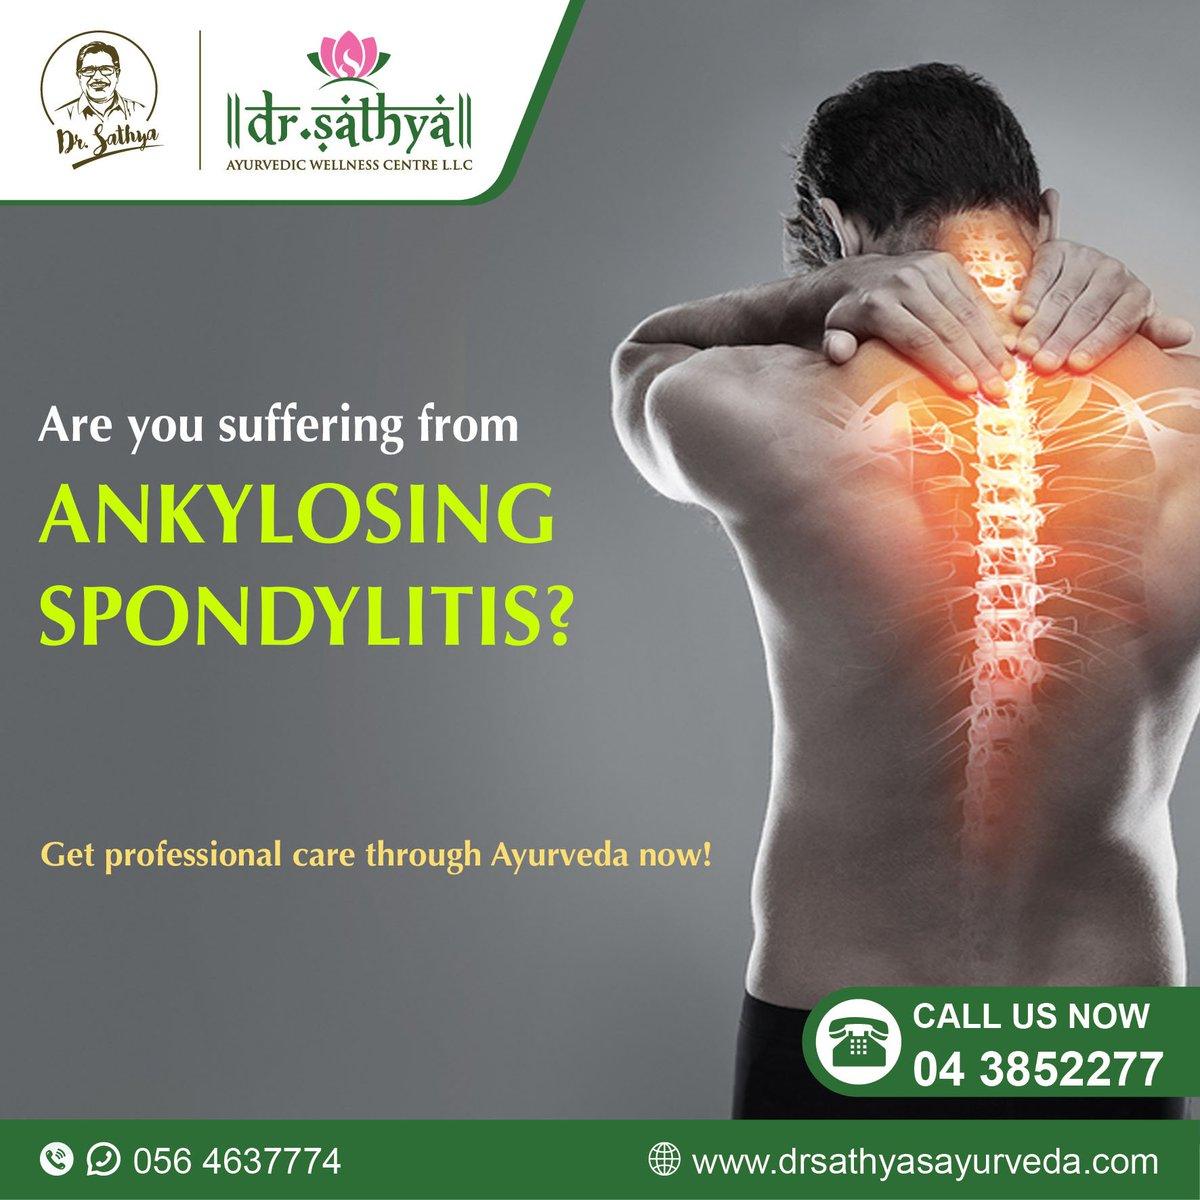 Dr  Sathya Ayurvedic Wellness Centre LLC on Twitter: